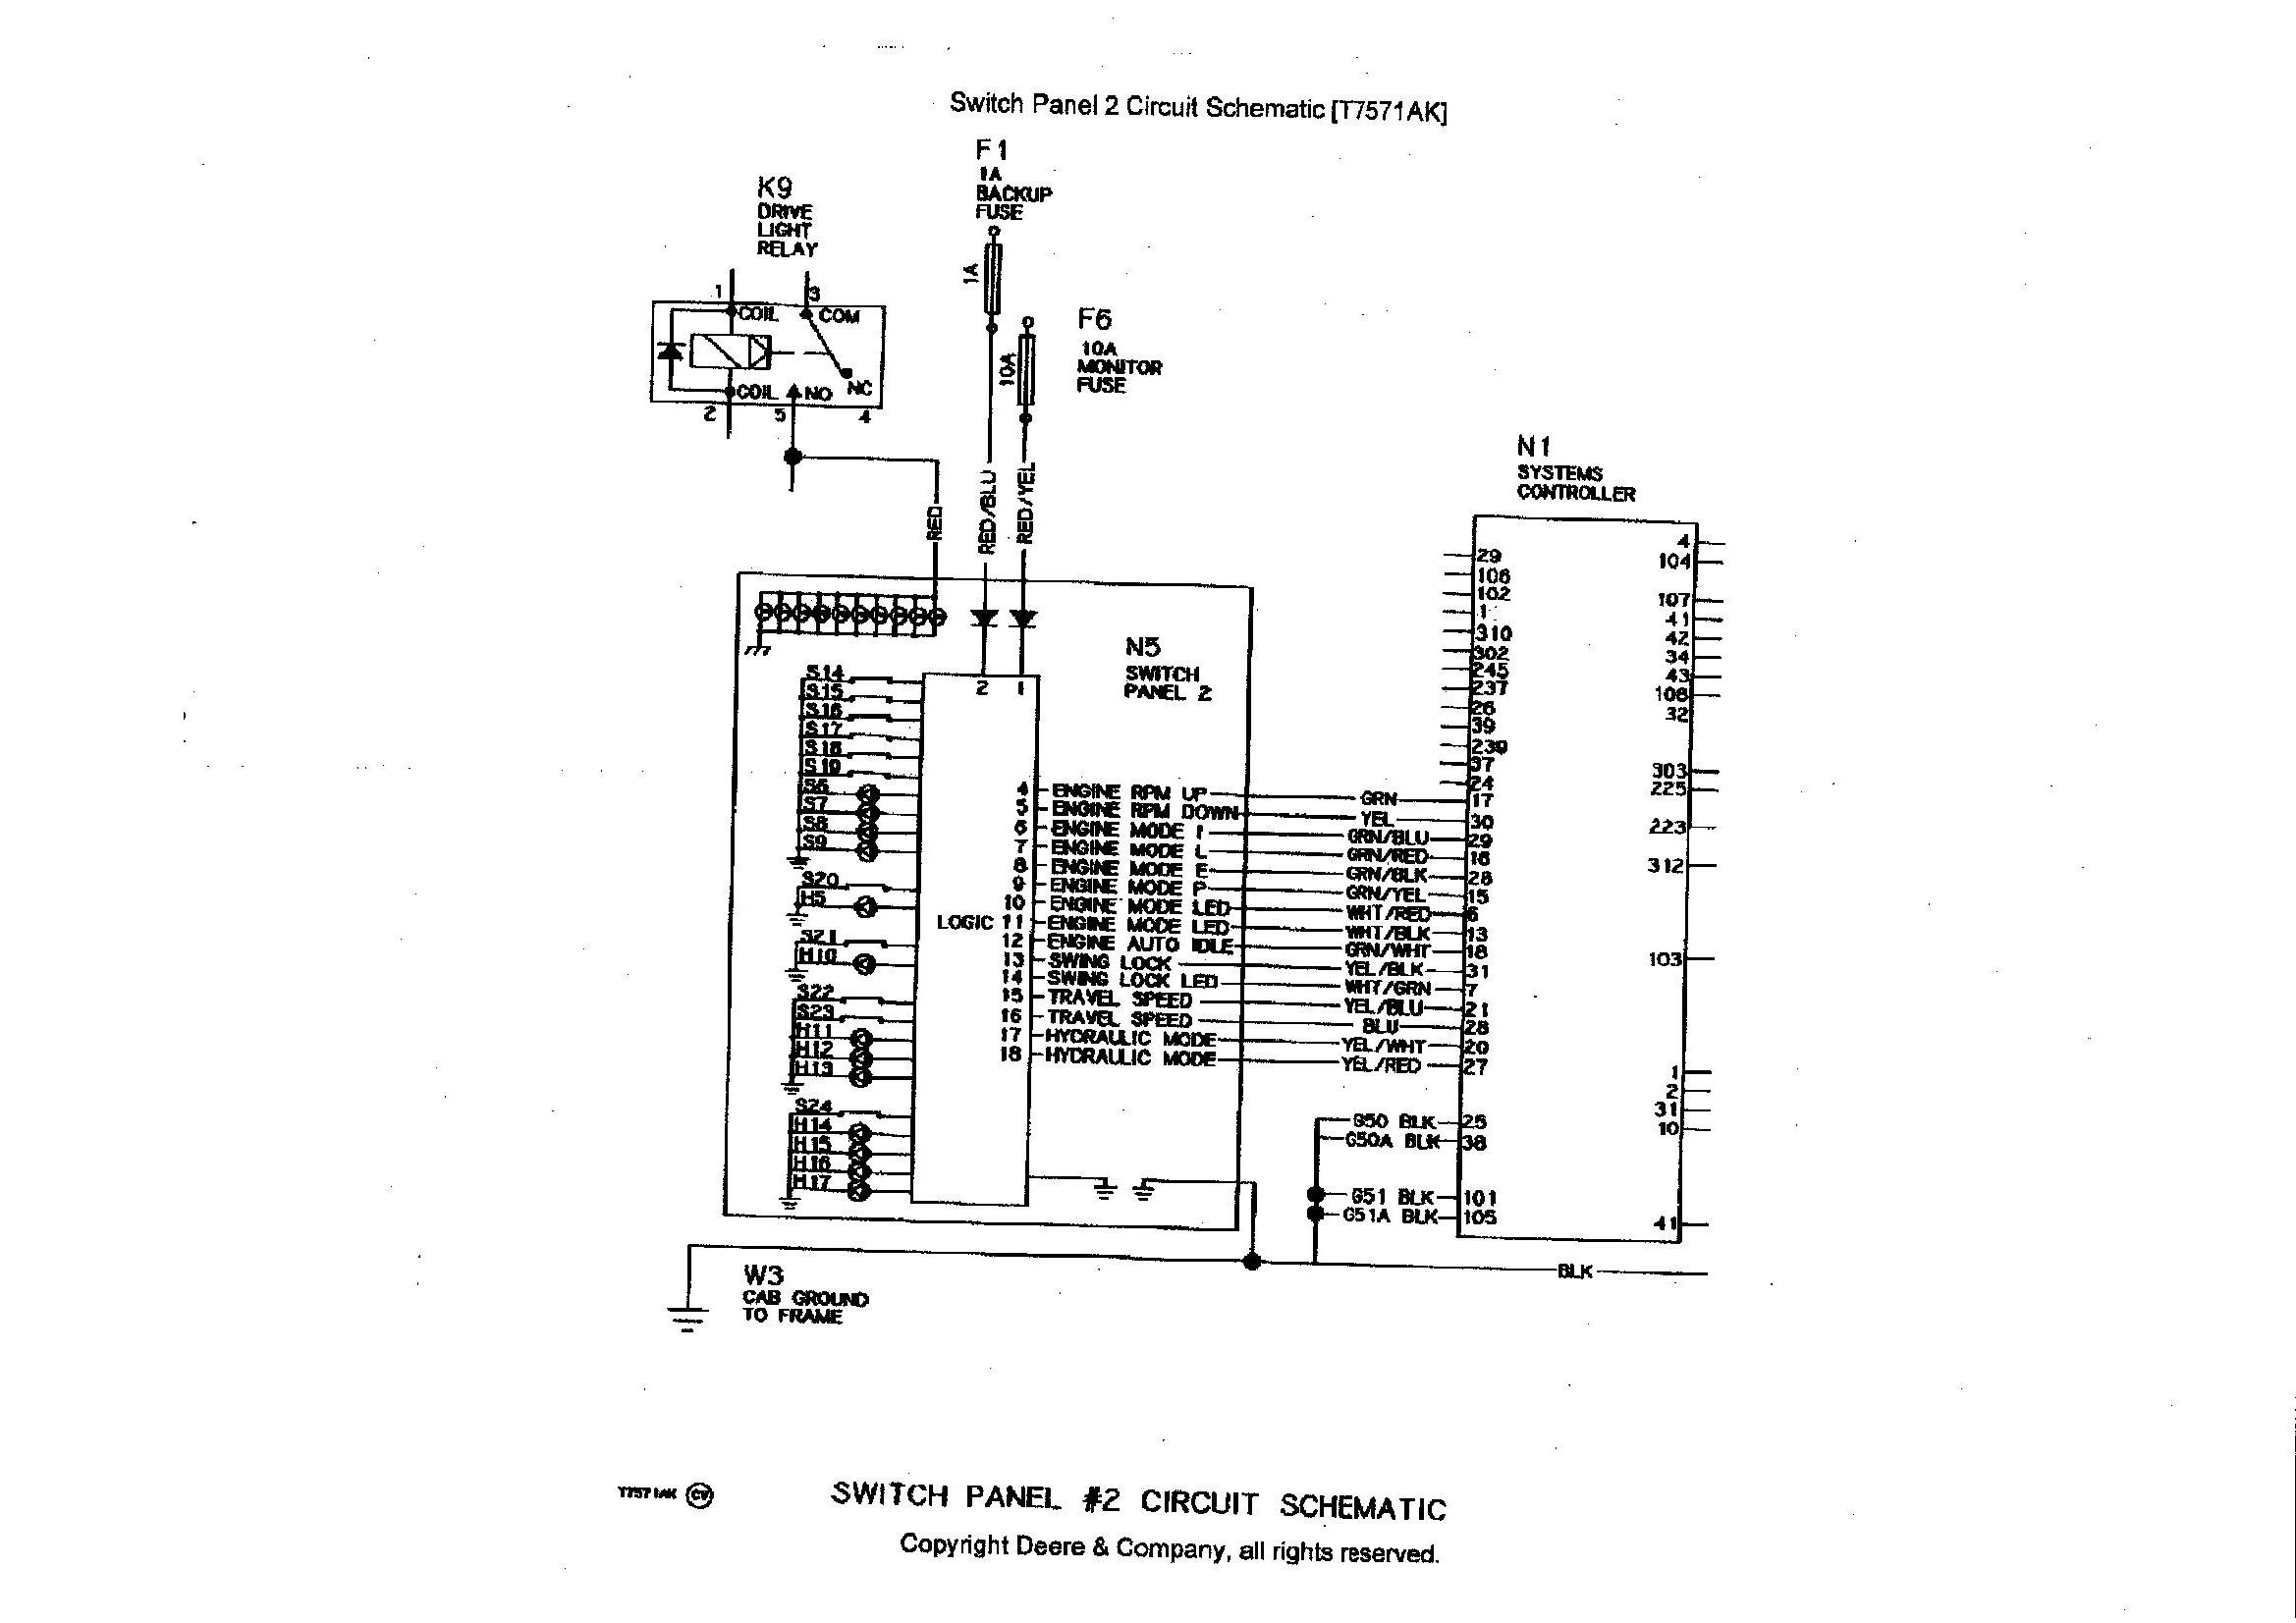 John Deere Wiring Harness Diagram 690e Lc Just Wiring Diagram